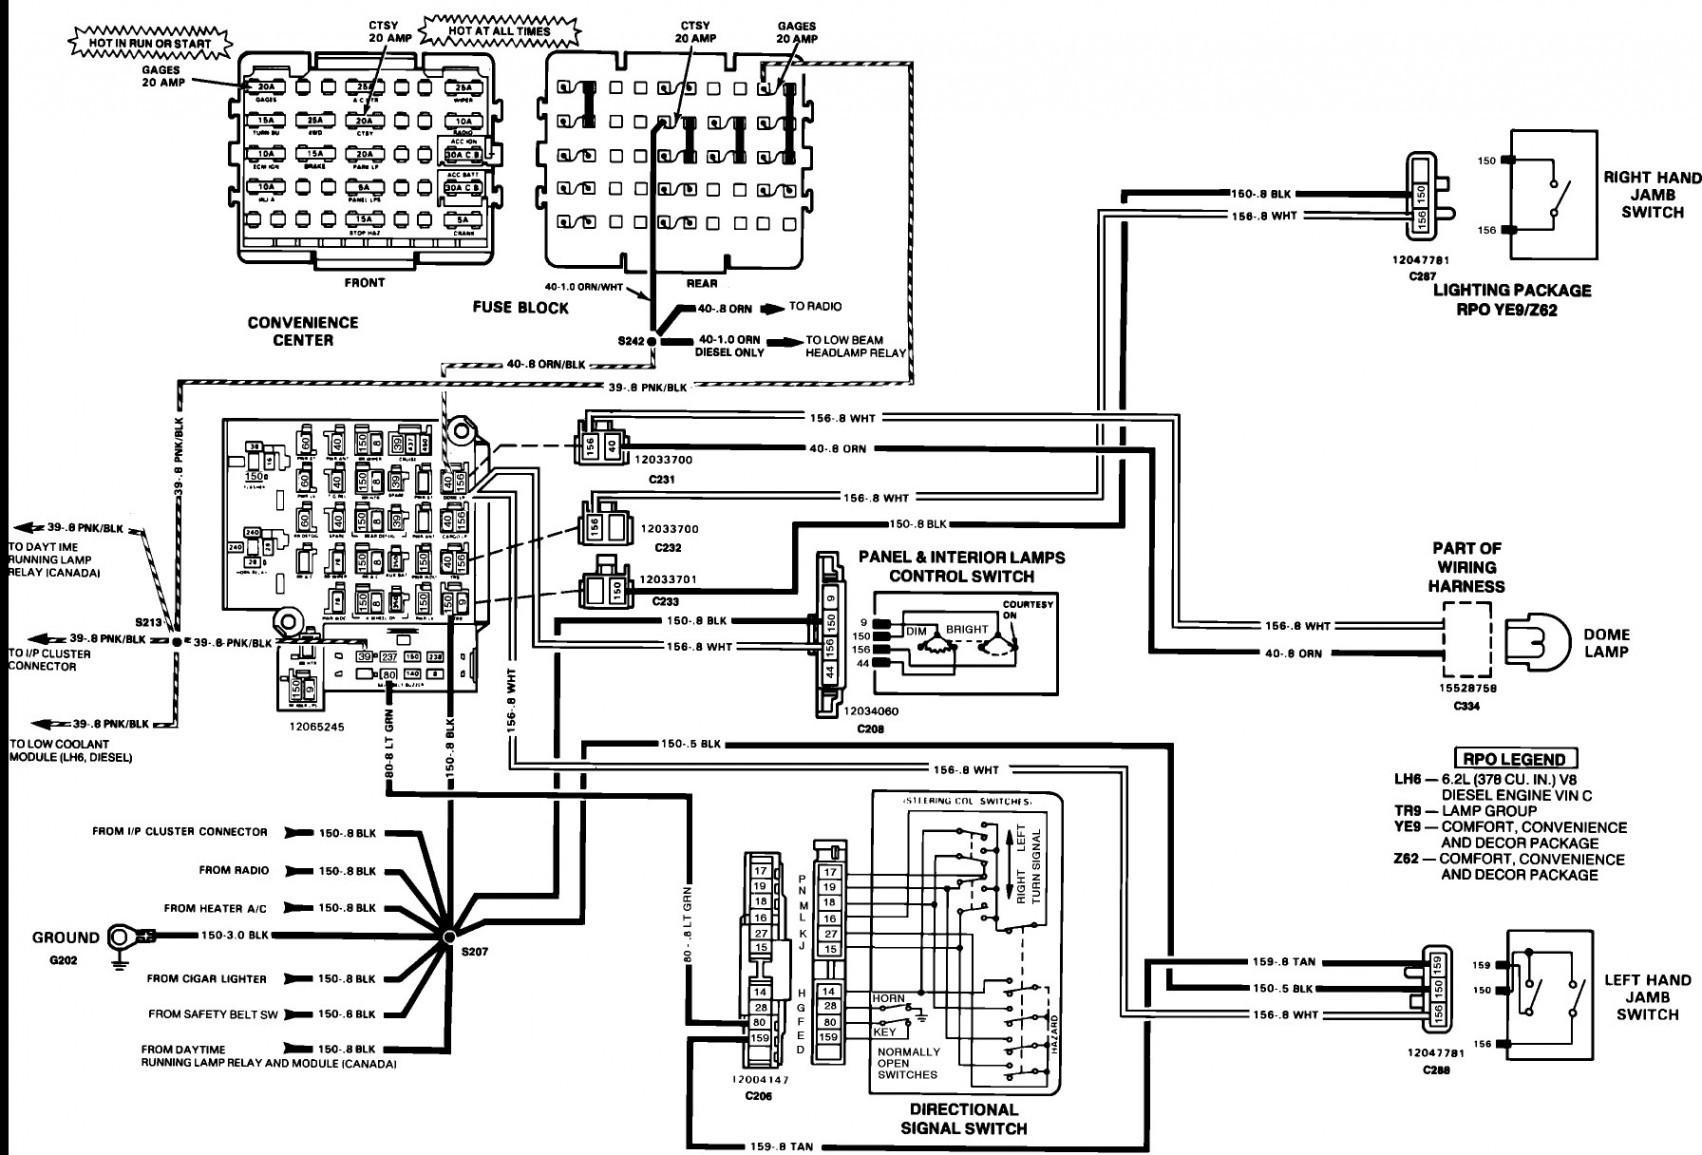 hight resolution of cb360 wiring diagram motorcycle schematics wiring diagrams u2022 rh ssl forum com 1975 honda cl360 craigslist